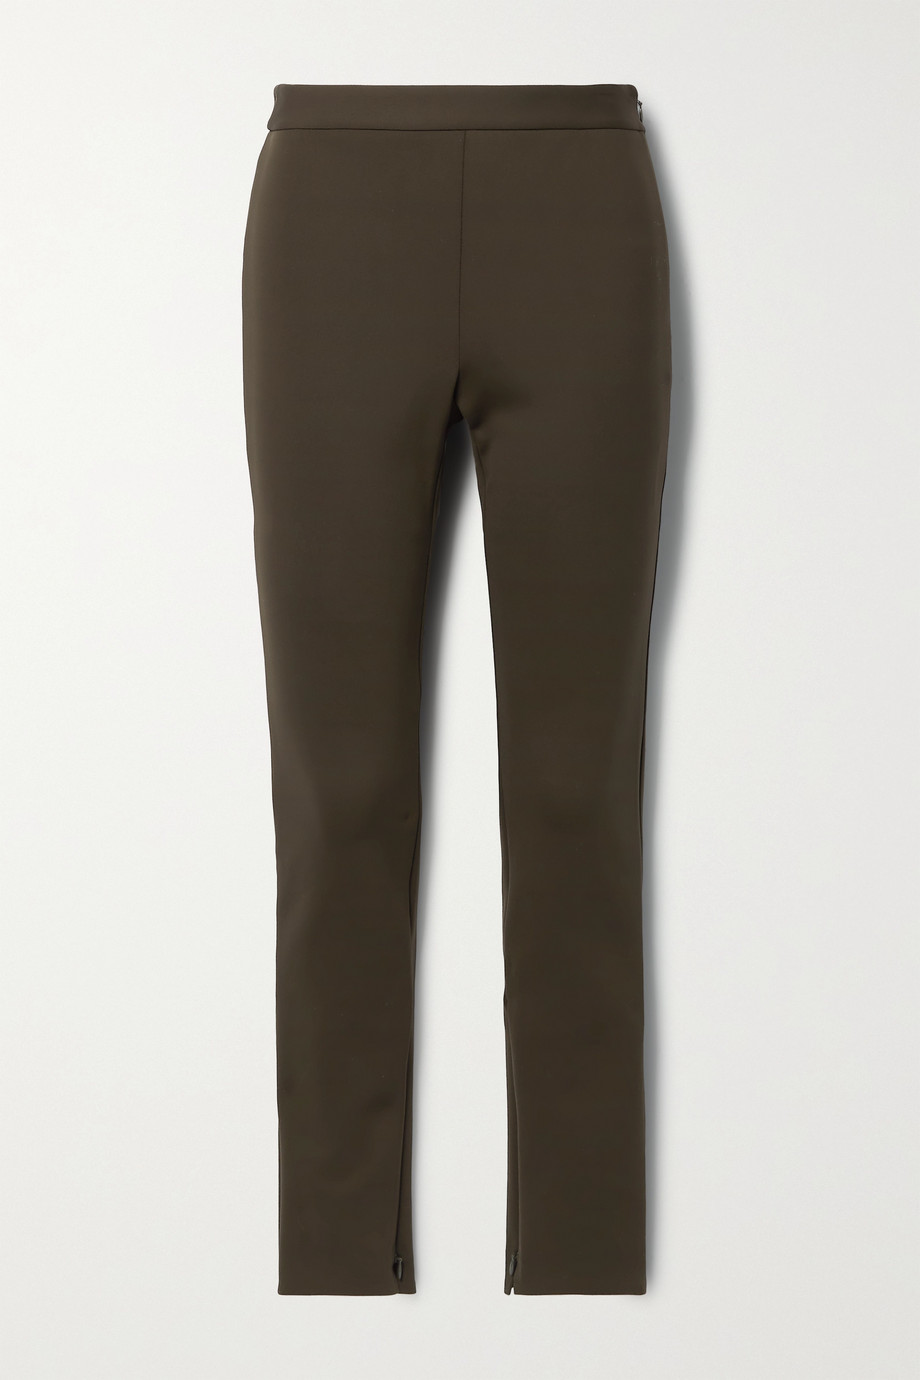 Theory Stretch-jersey skinny pants